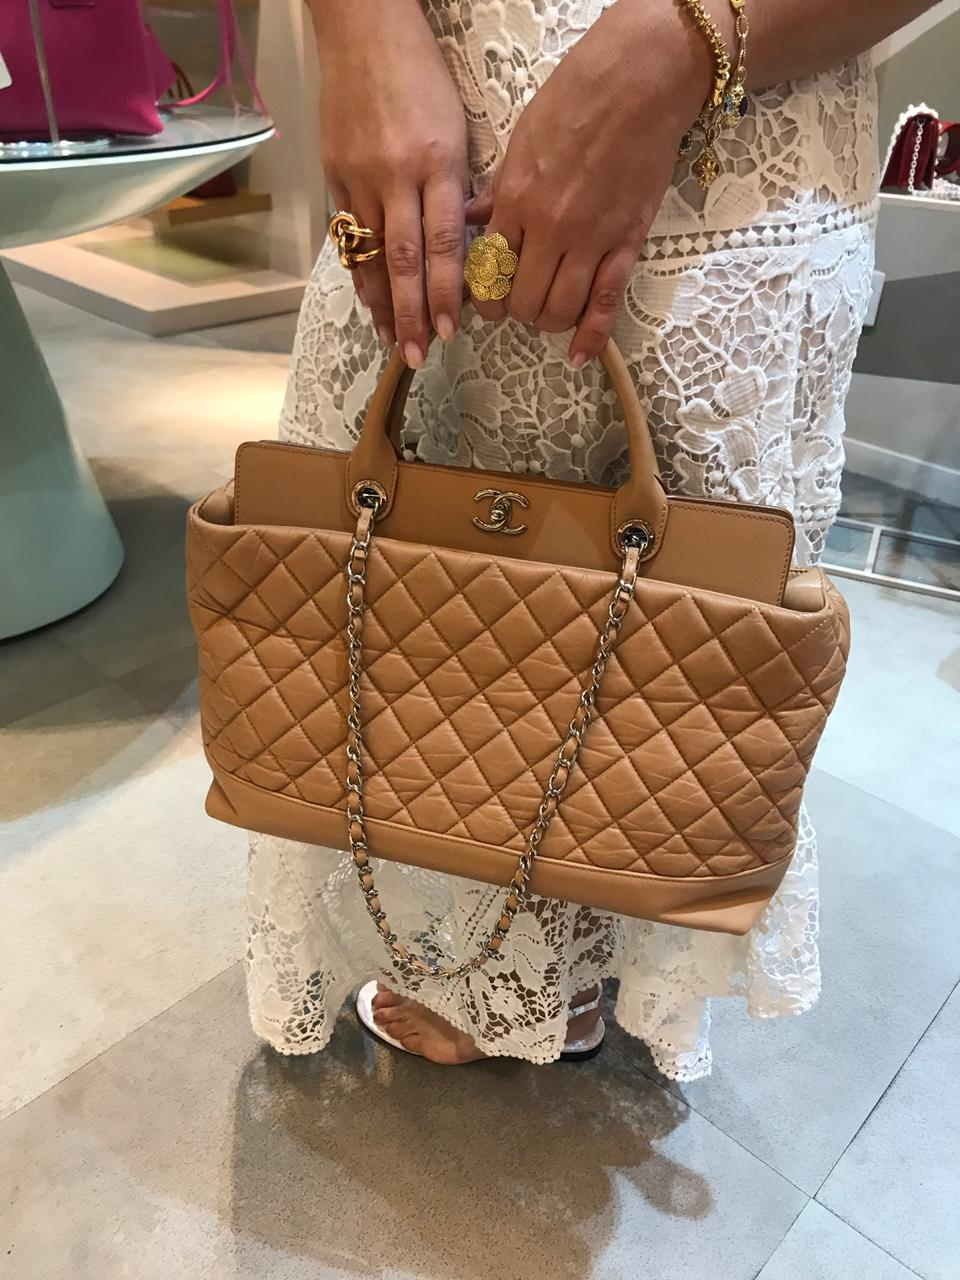 Bolsa Chanel Maxi Bage - VENDIDA